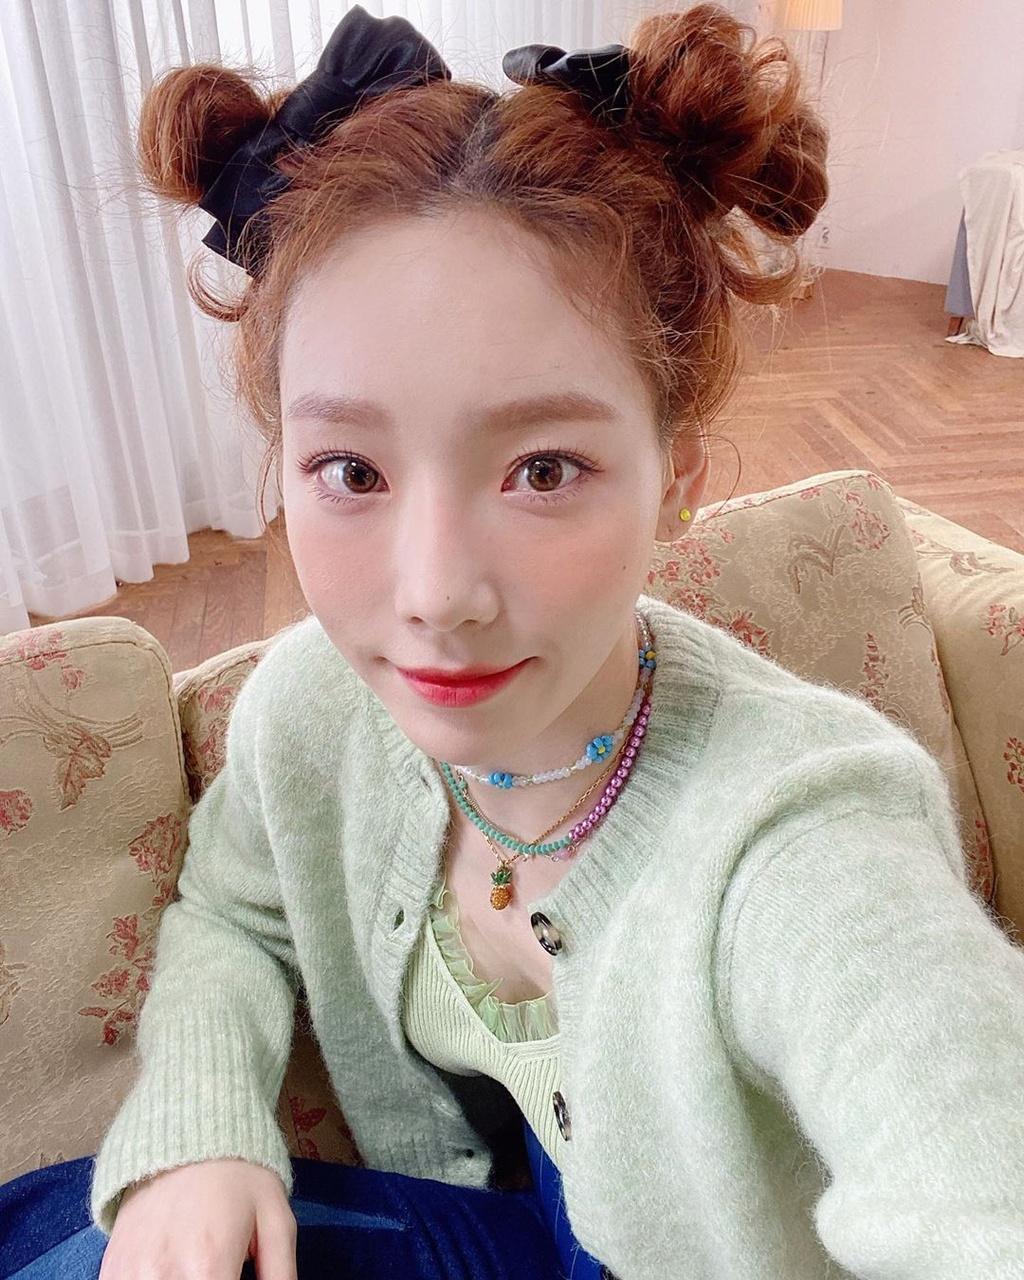 Taeyeon cham soc da nhu the nao anh 4